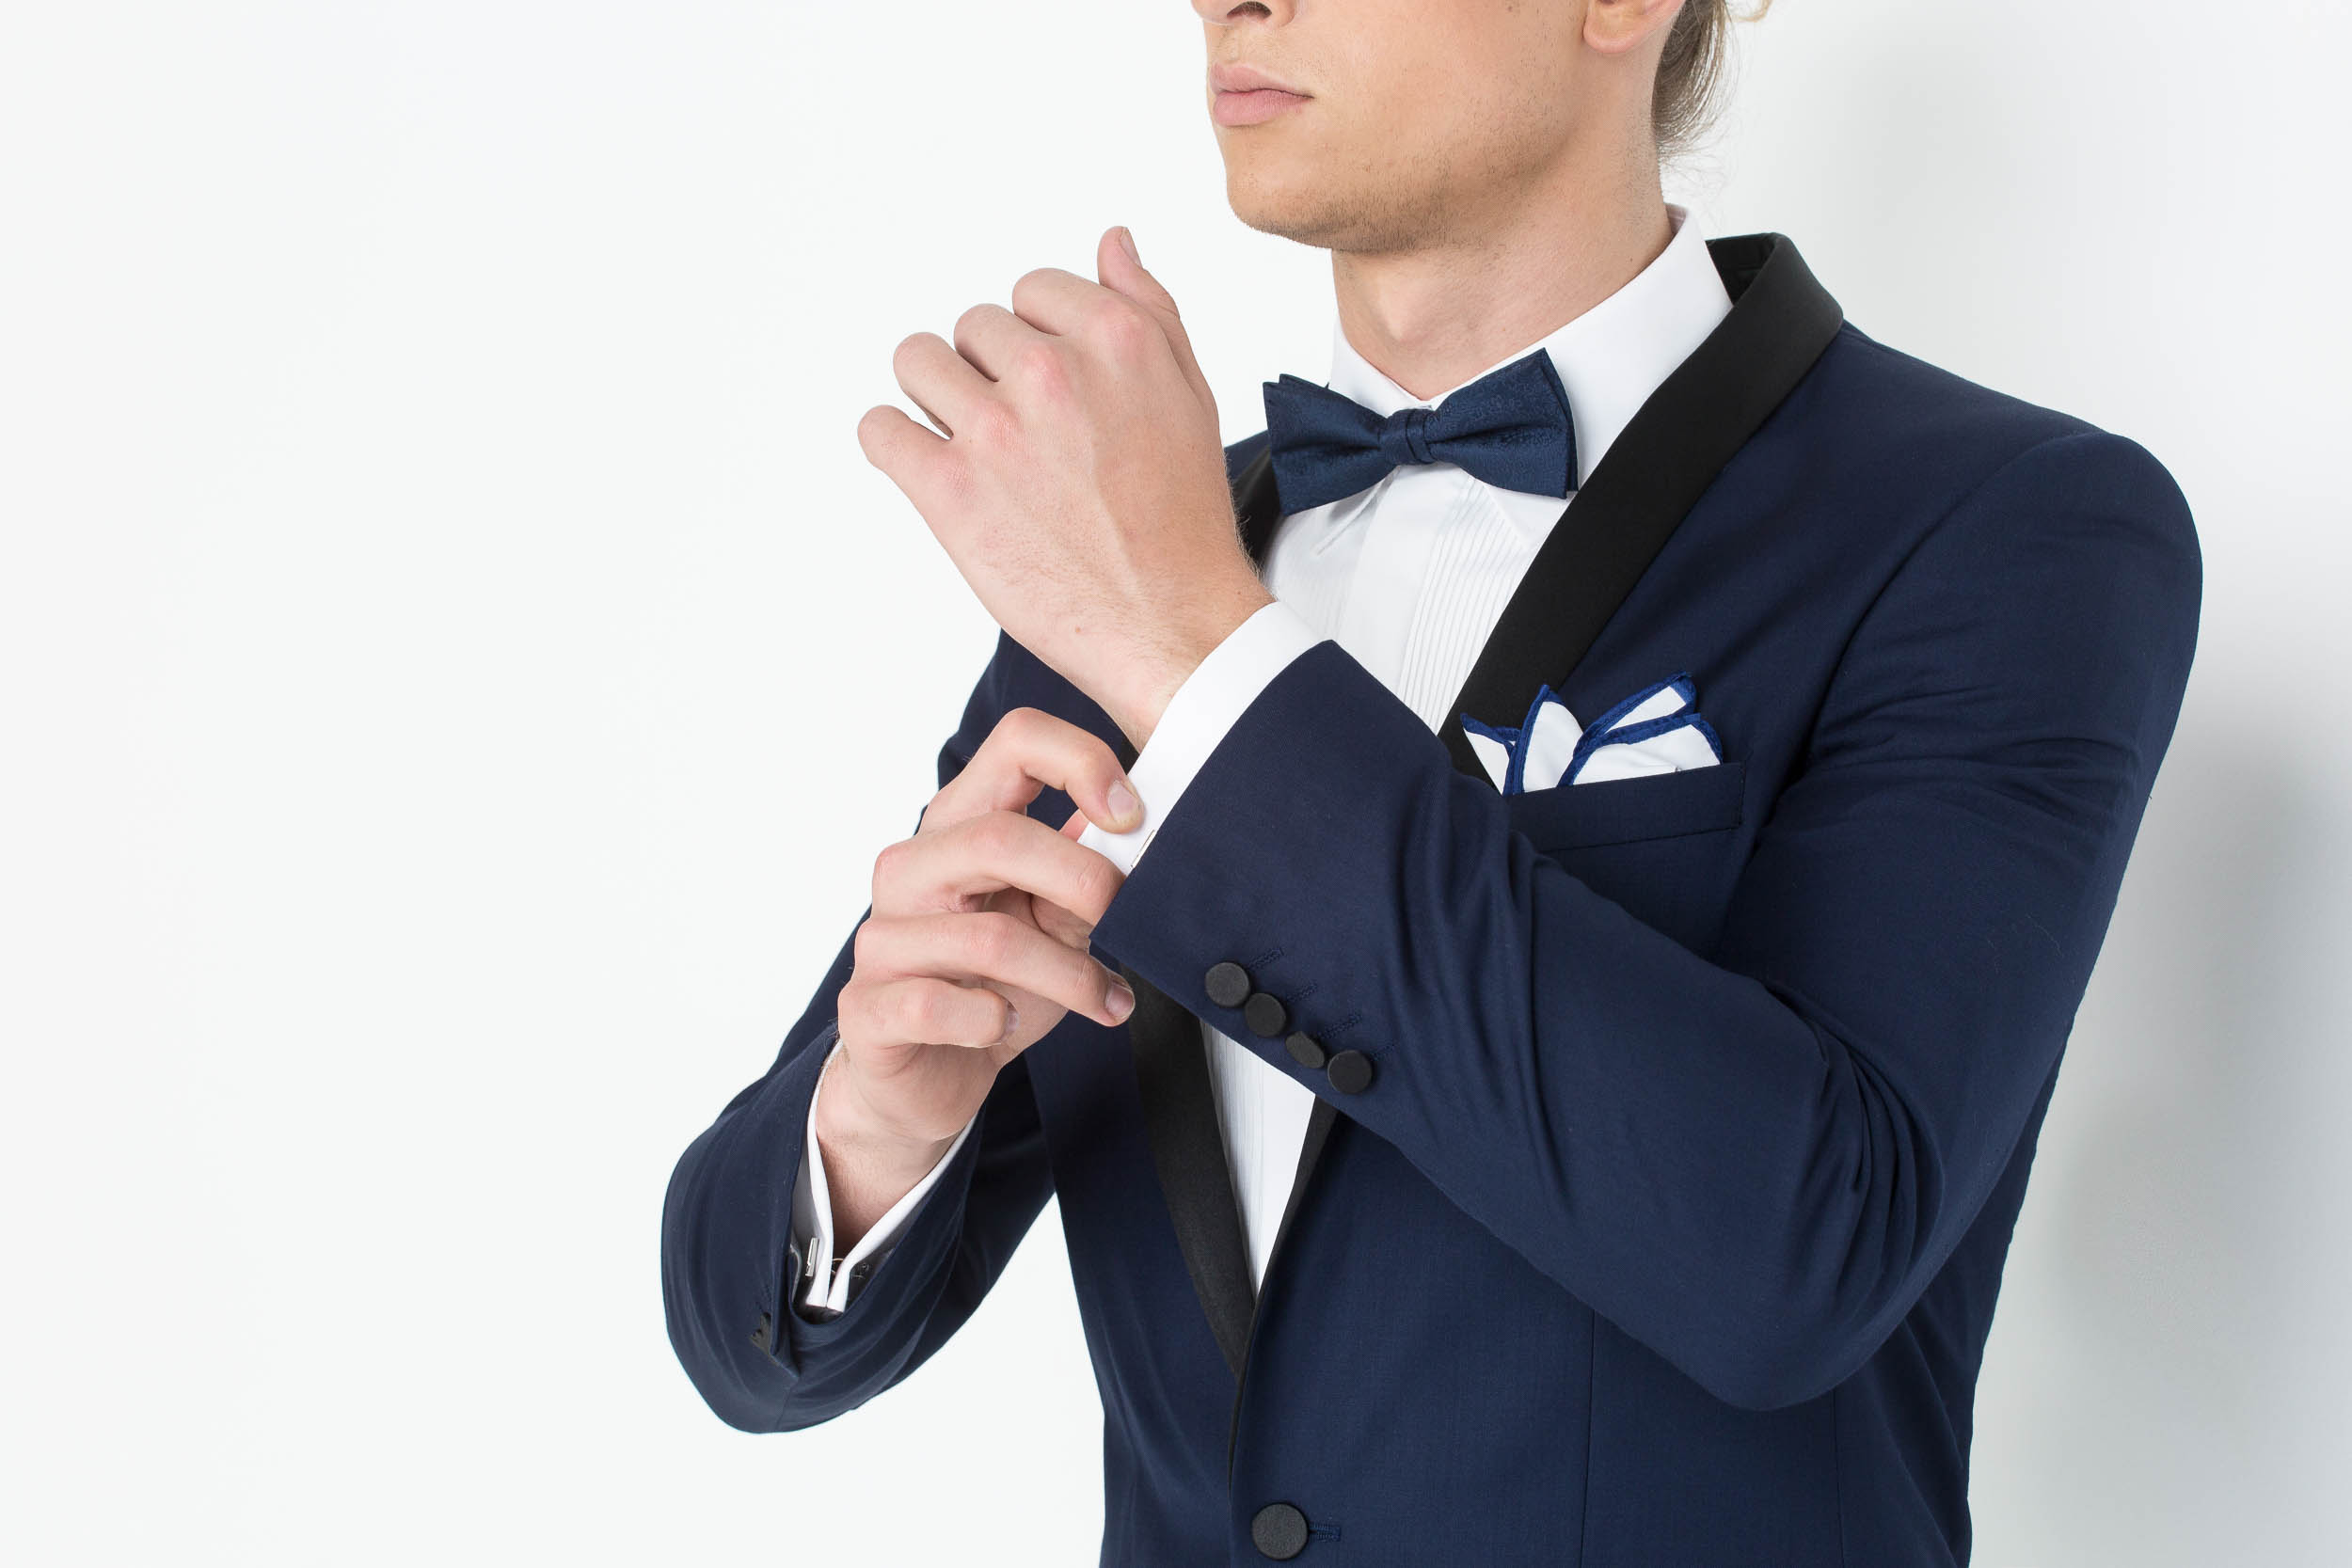 Commercial Mens Fashion Photography by Nick Walters for Ferrari Formalwear3.jpg